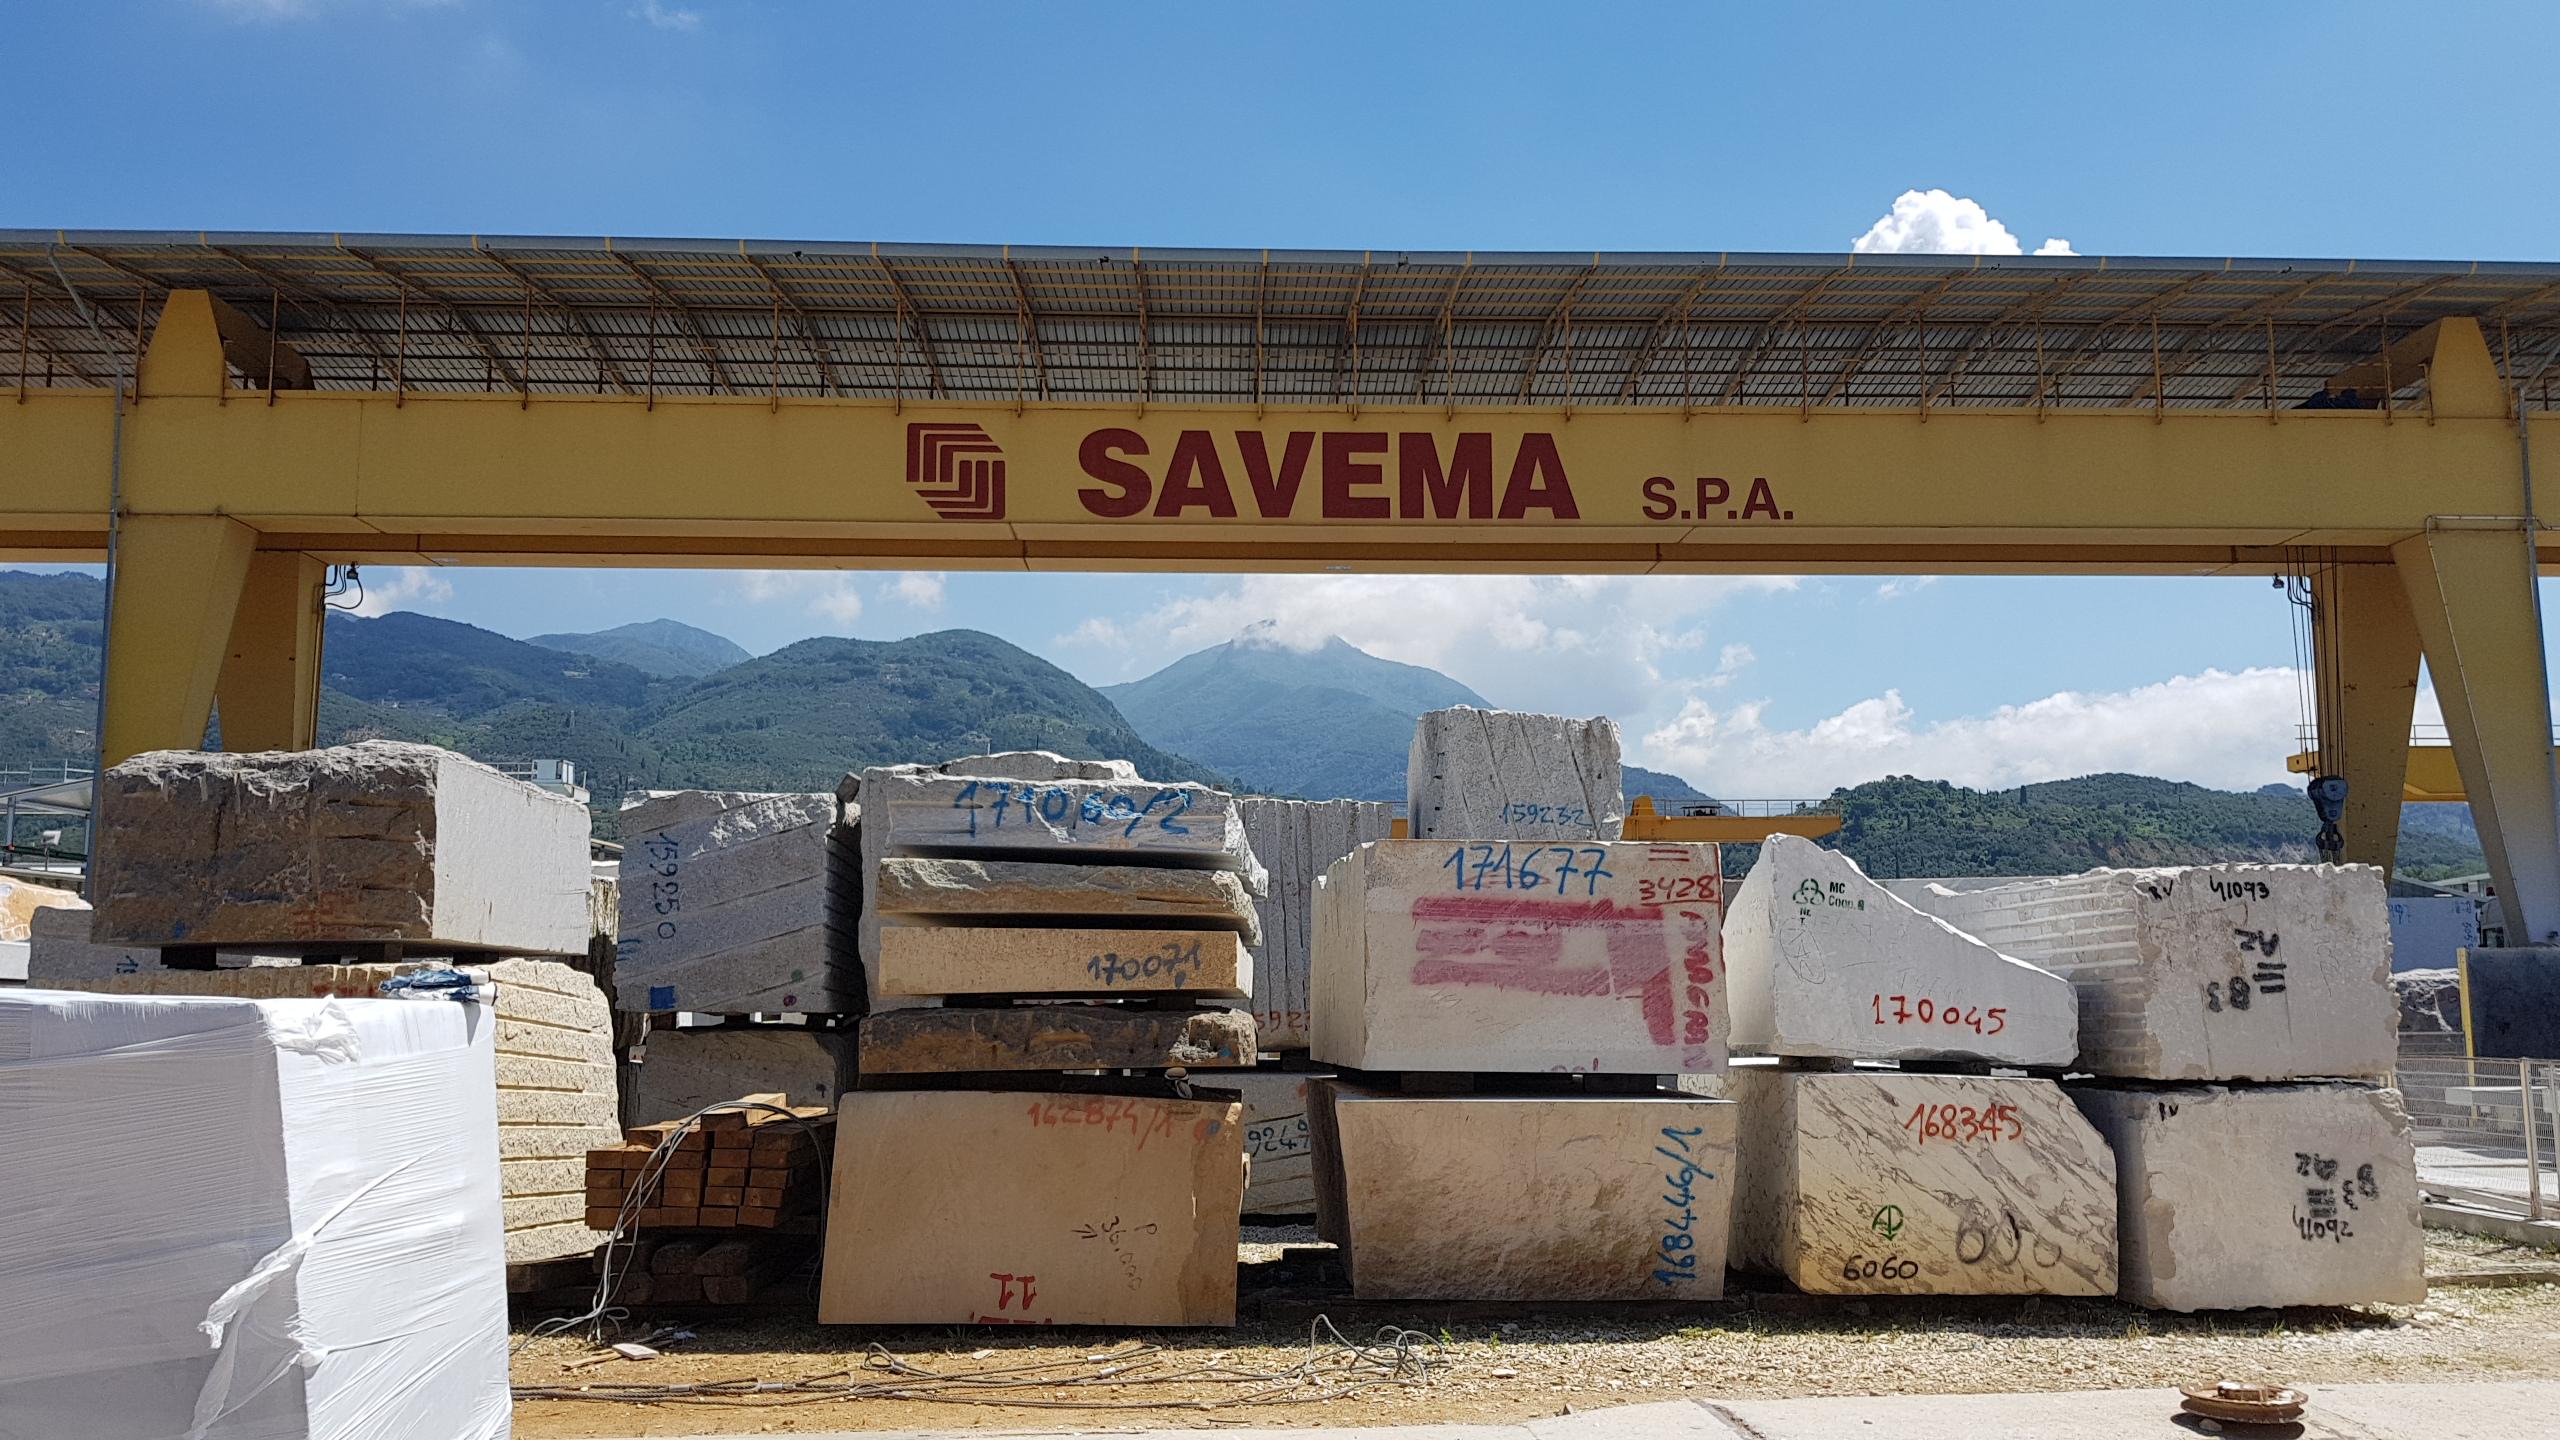 CORSAIR visita l'azienda SAVEMA Spa